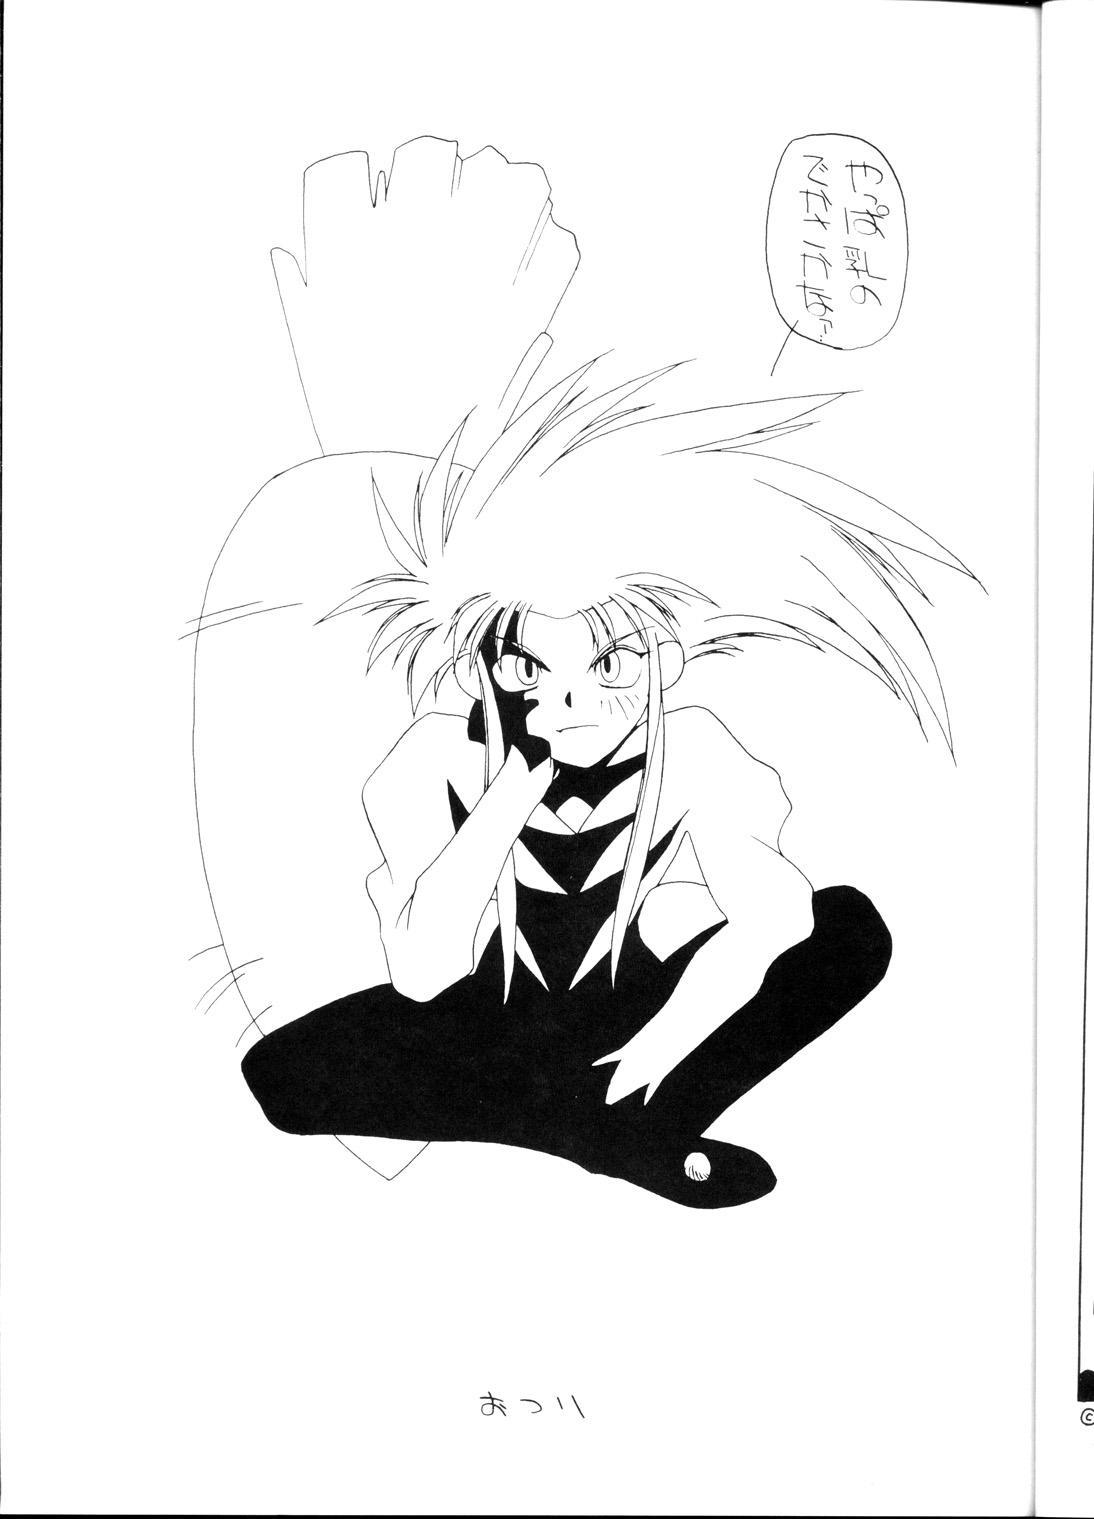 [B.B.C] Tenchi Muyou! Ryou-ou-ki Kaiteiben (Tenchi Muyou!) 13